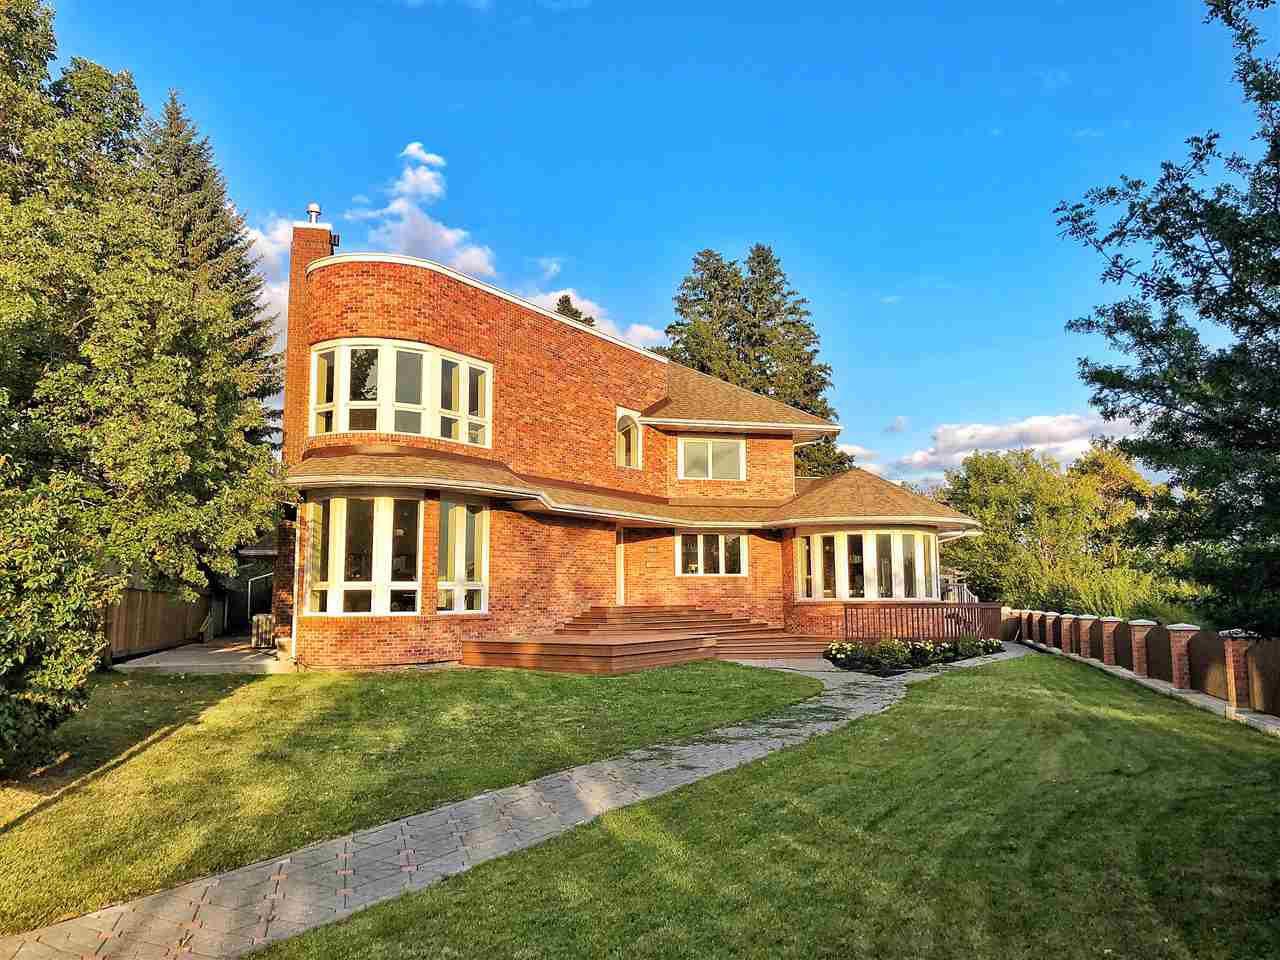 Main Photo: 9401 97 Street in Edmonton: Zone 18 House for sale : MLS®# E4132648